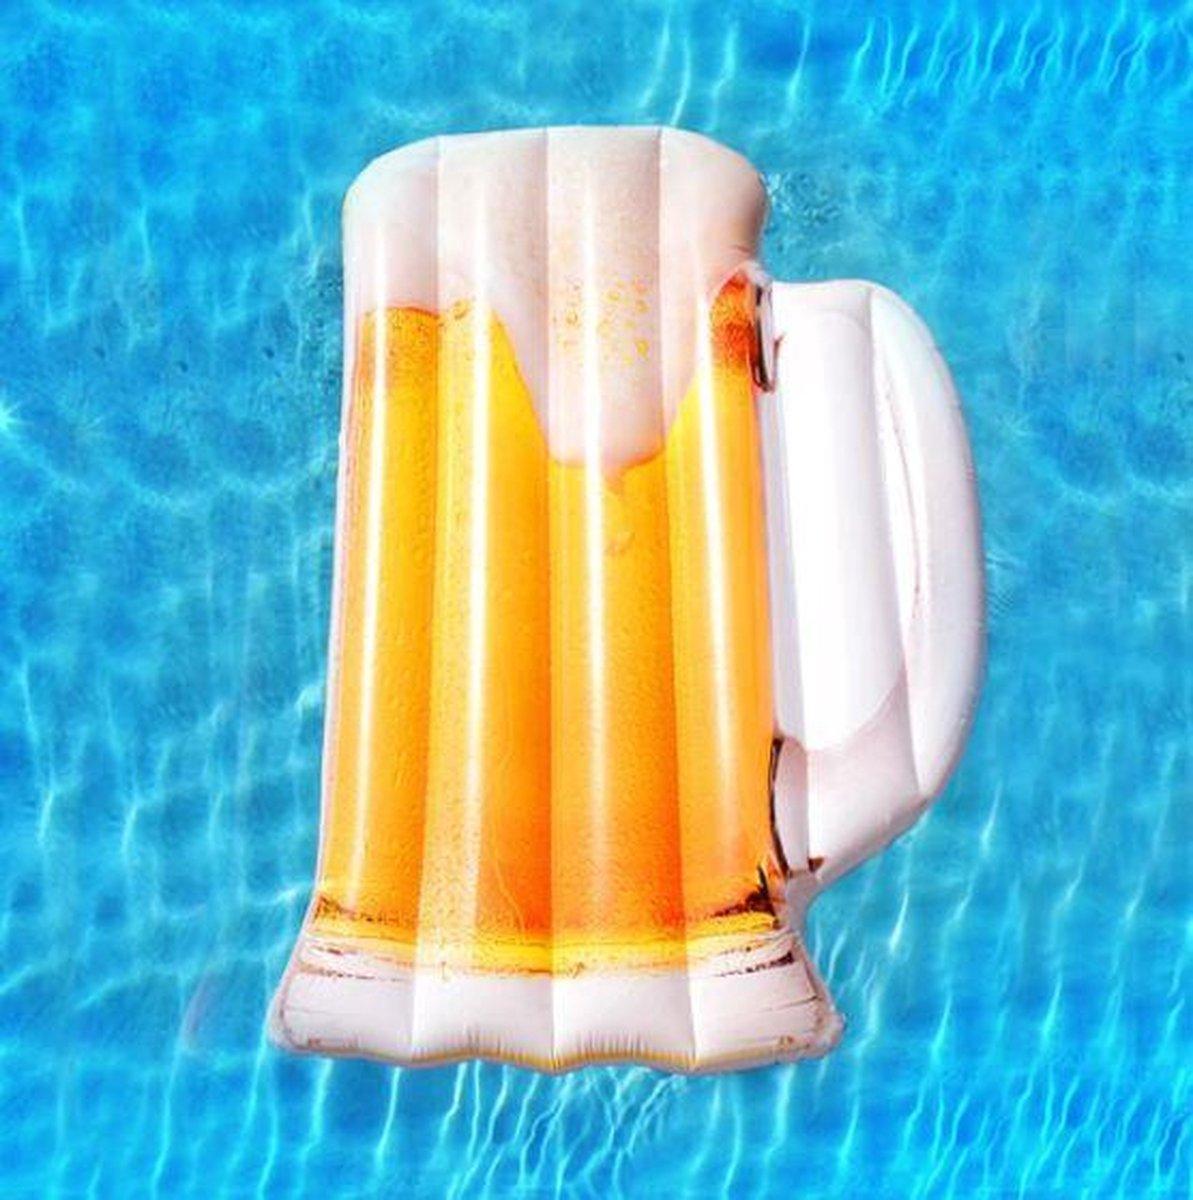 Bierglas luchtbed - Luchtbed bier - Pils luchtbed - Opblaasbed bier - Zwemband bier - Zwembad - 182 cm